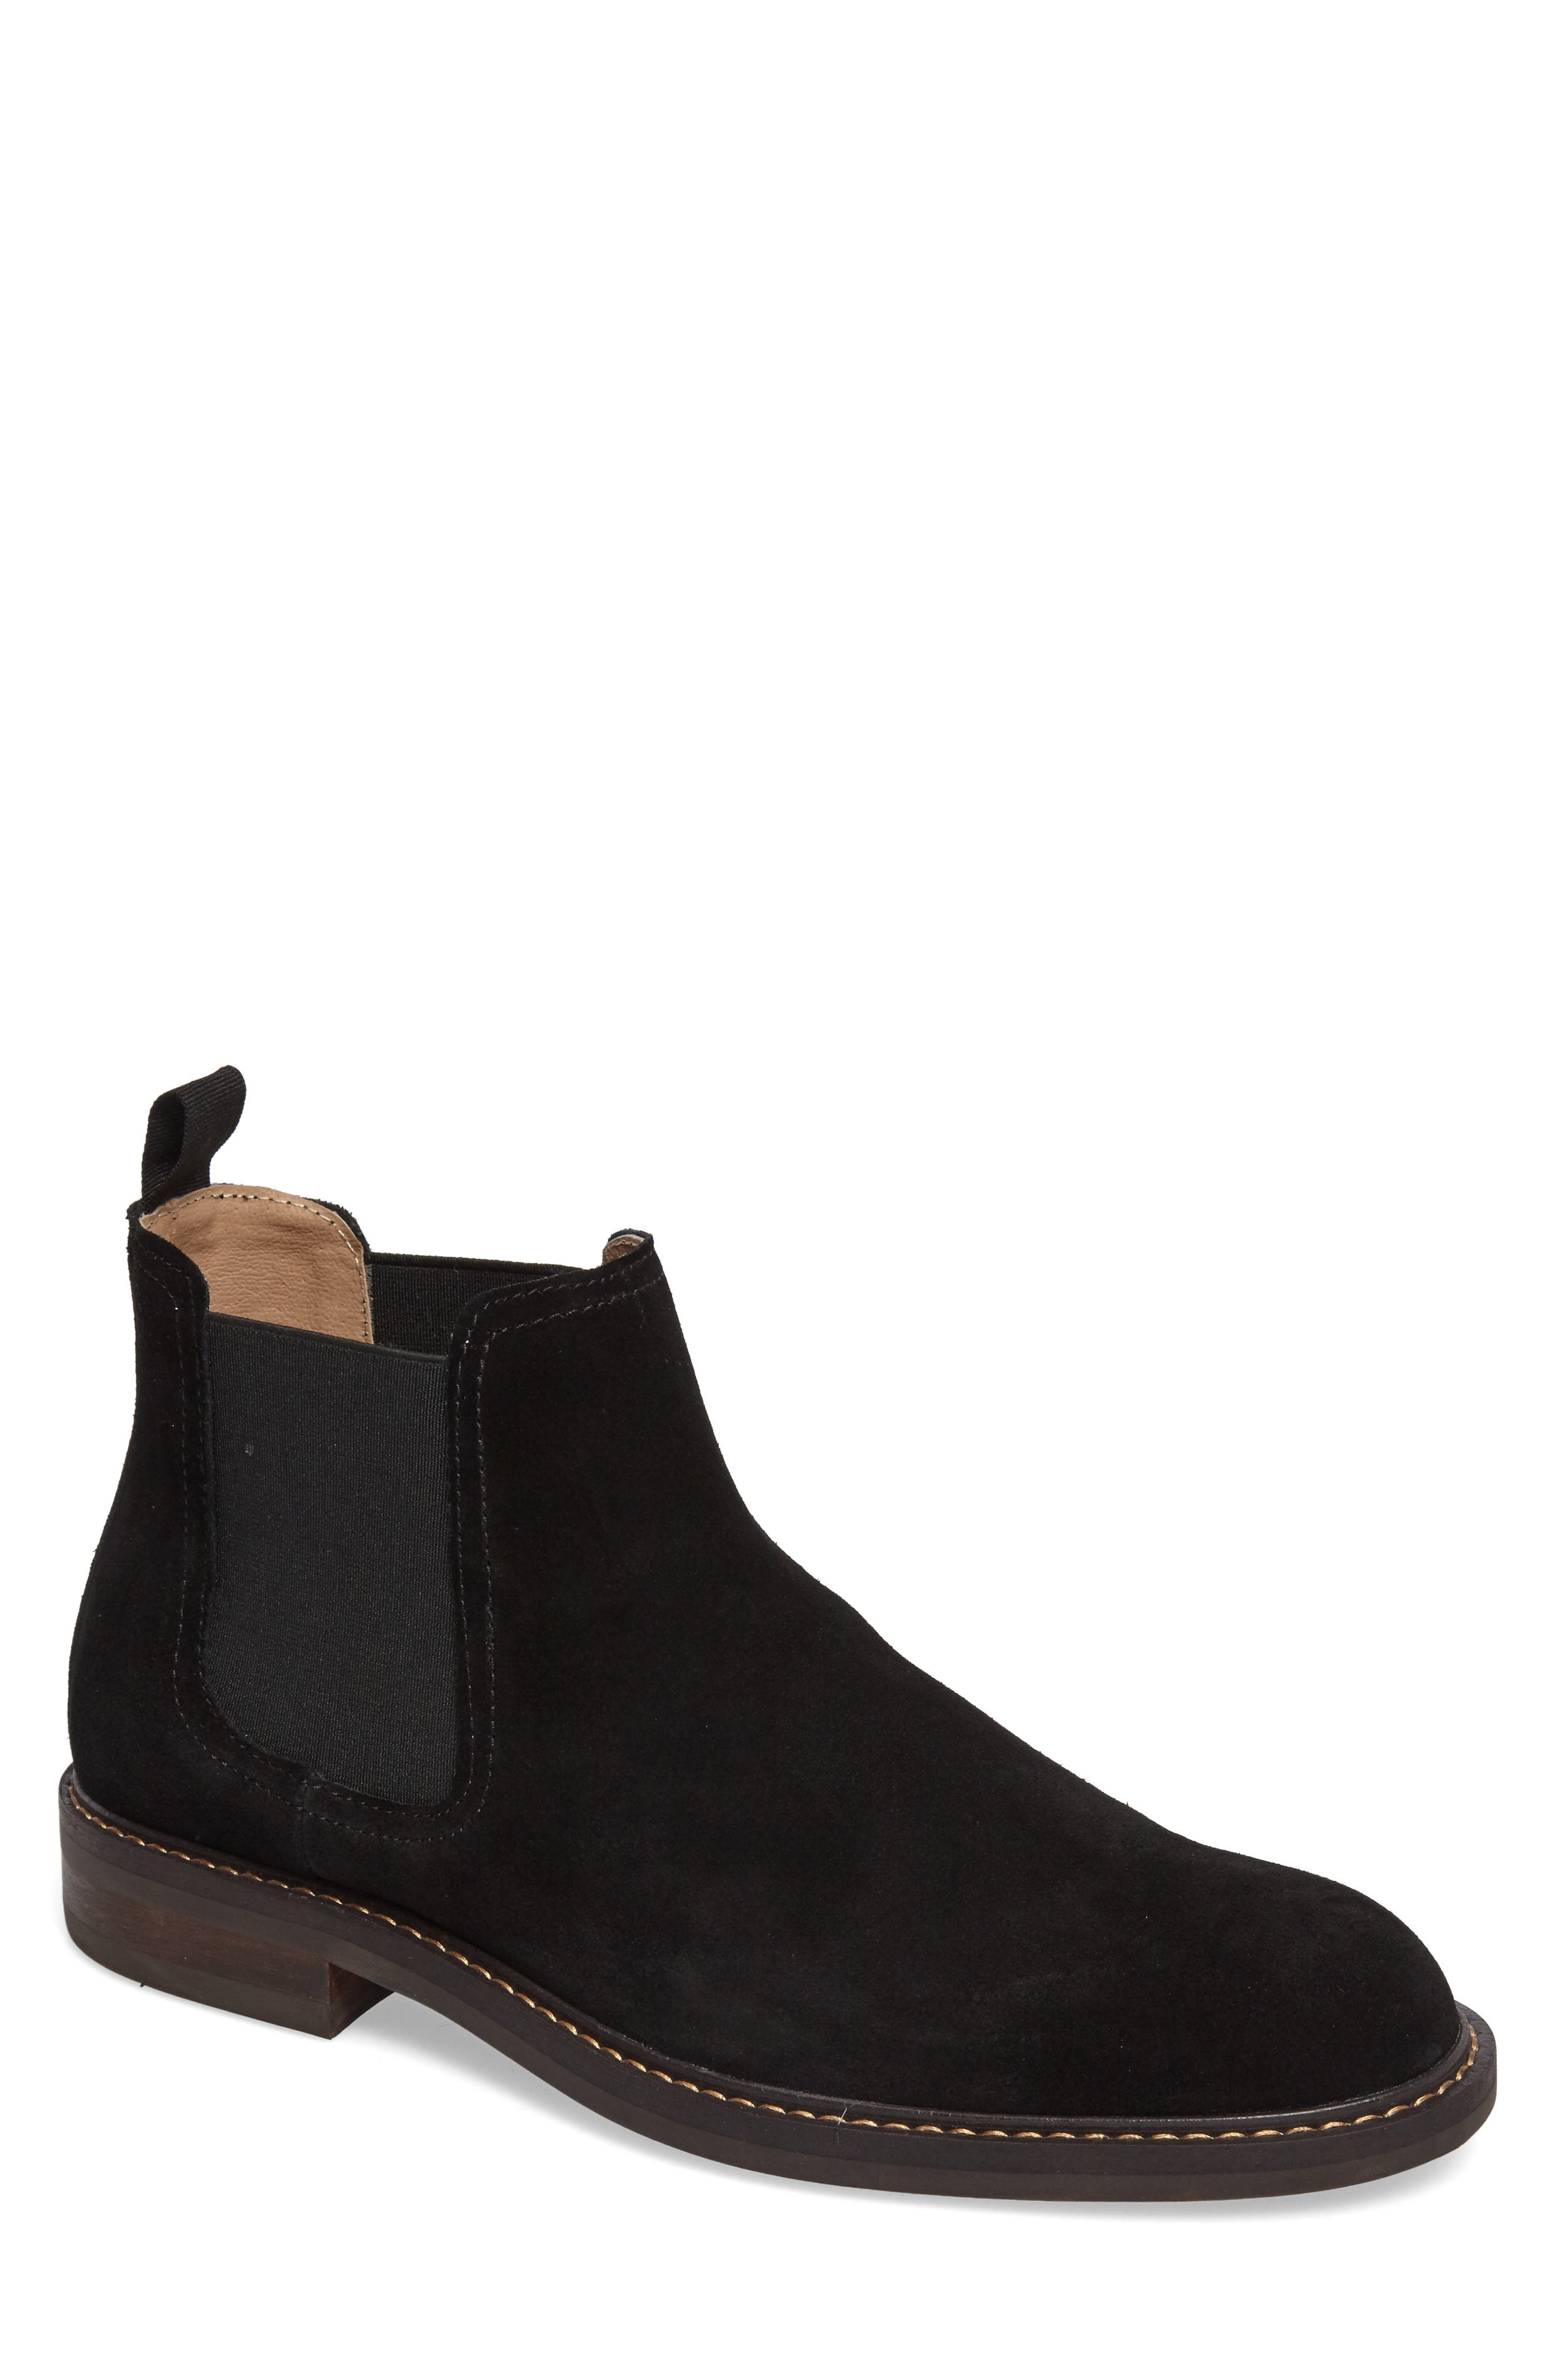 Horton Chelsea Boot,                         Main,                         color, 001